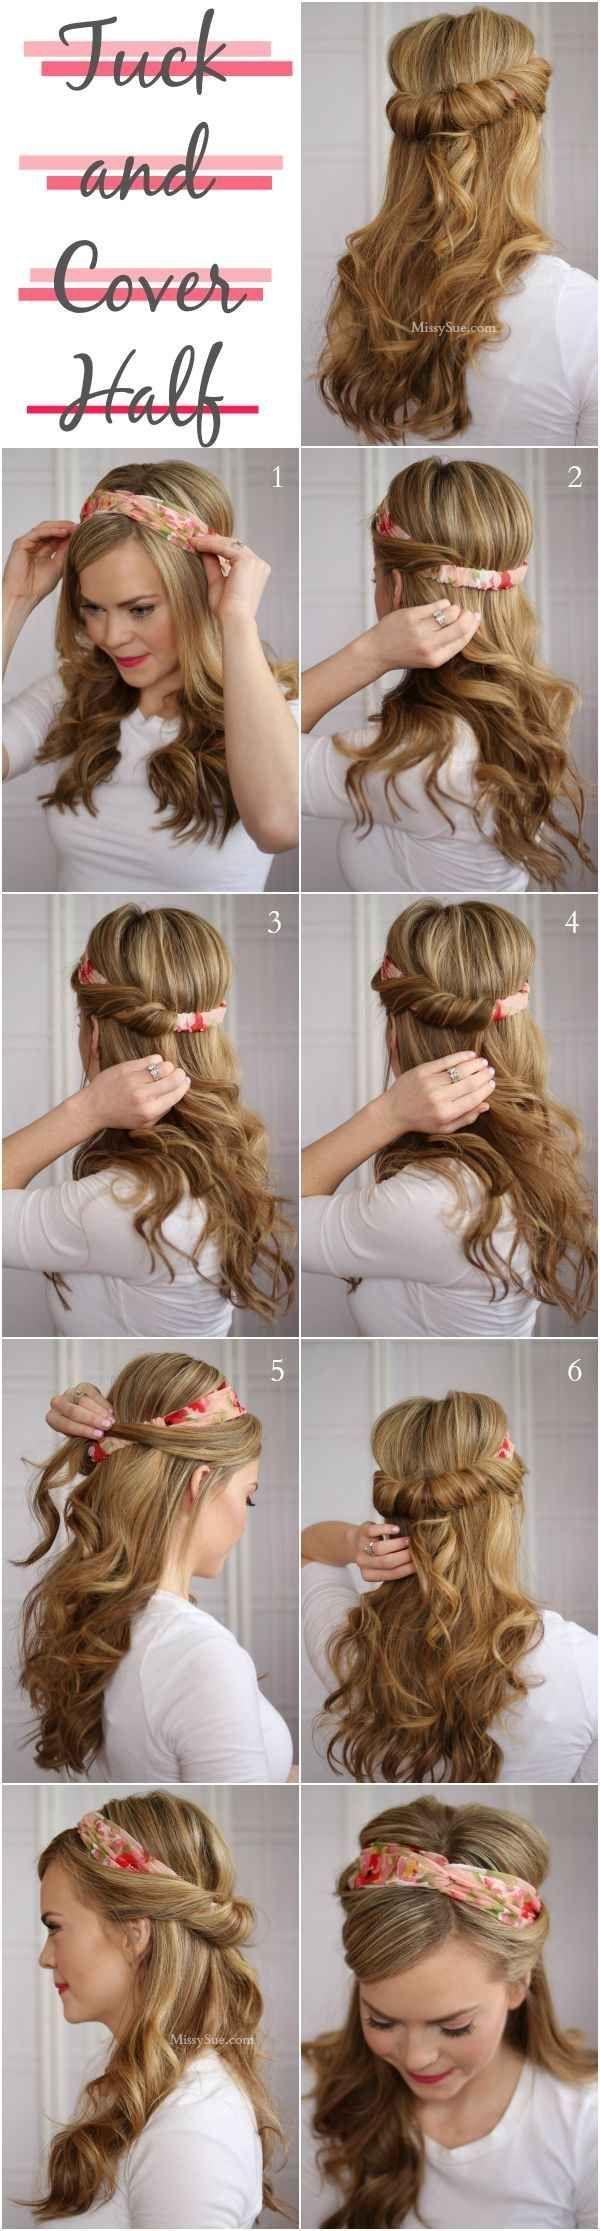 10 Stylish Hair Tutorials for Summer   Latest Bob HairStyles